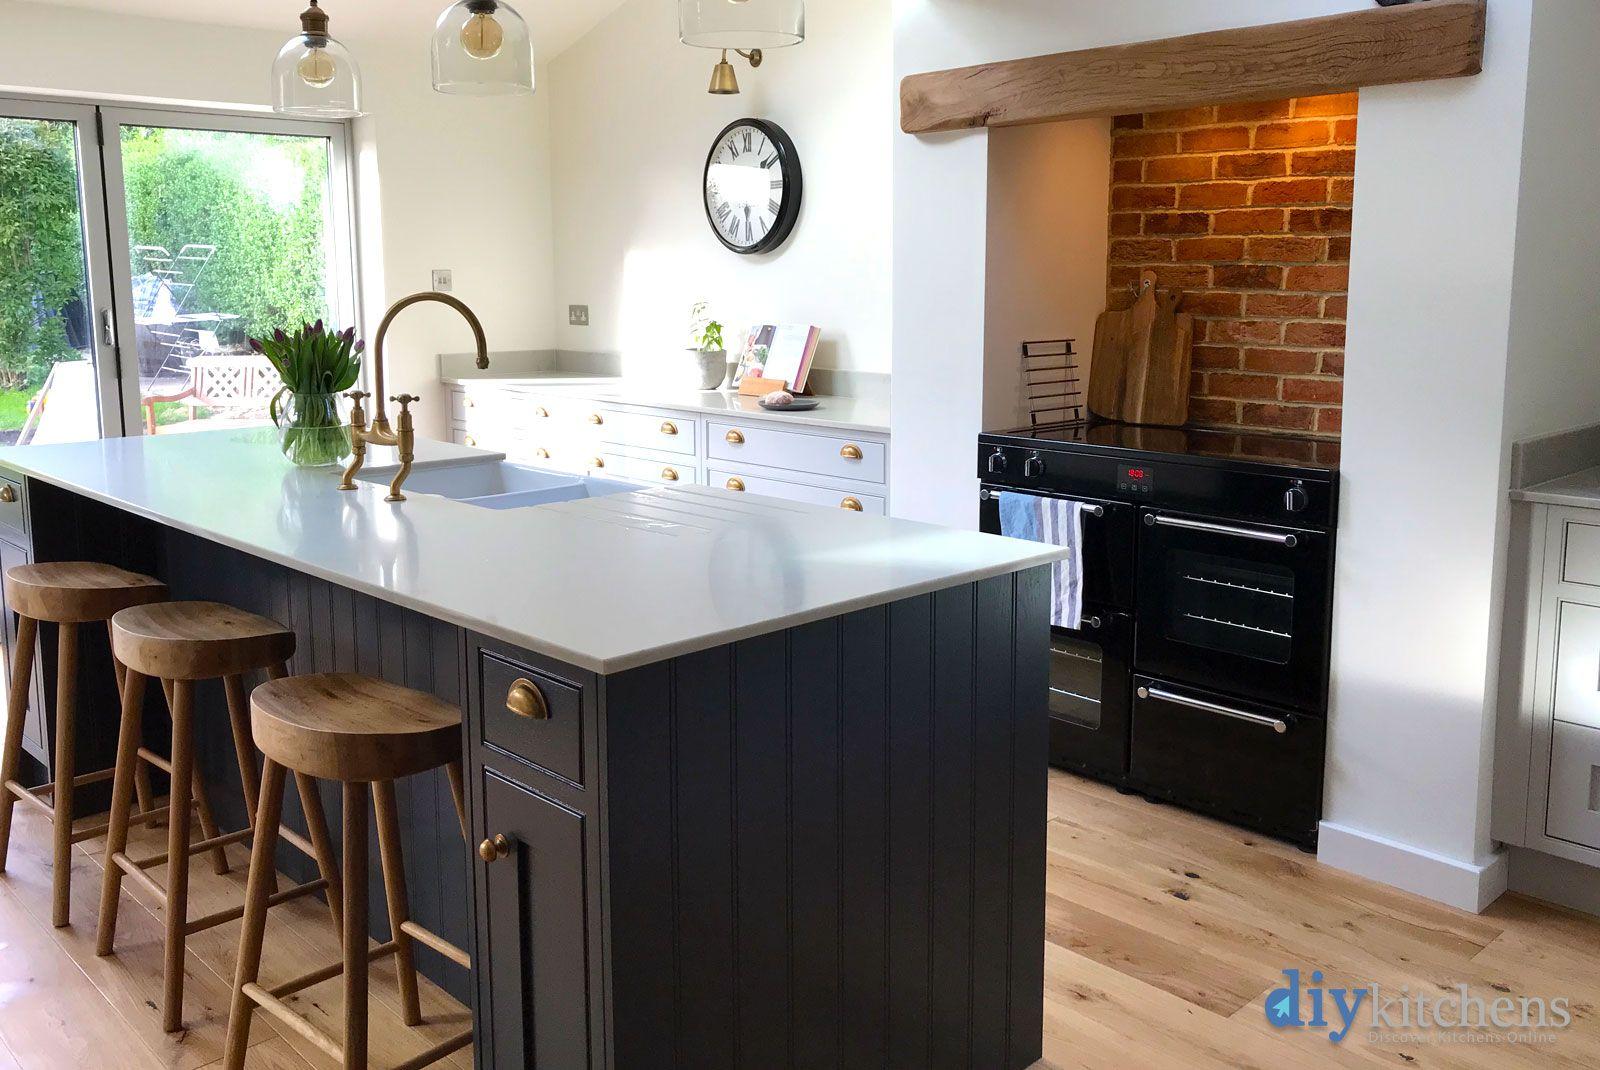 Best An Innova Helmsley Dove Grey Inframe Kitchen Inframe 400 x 300